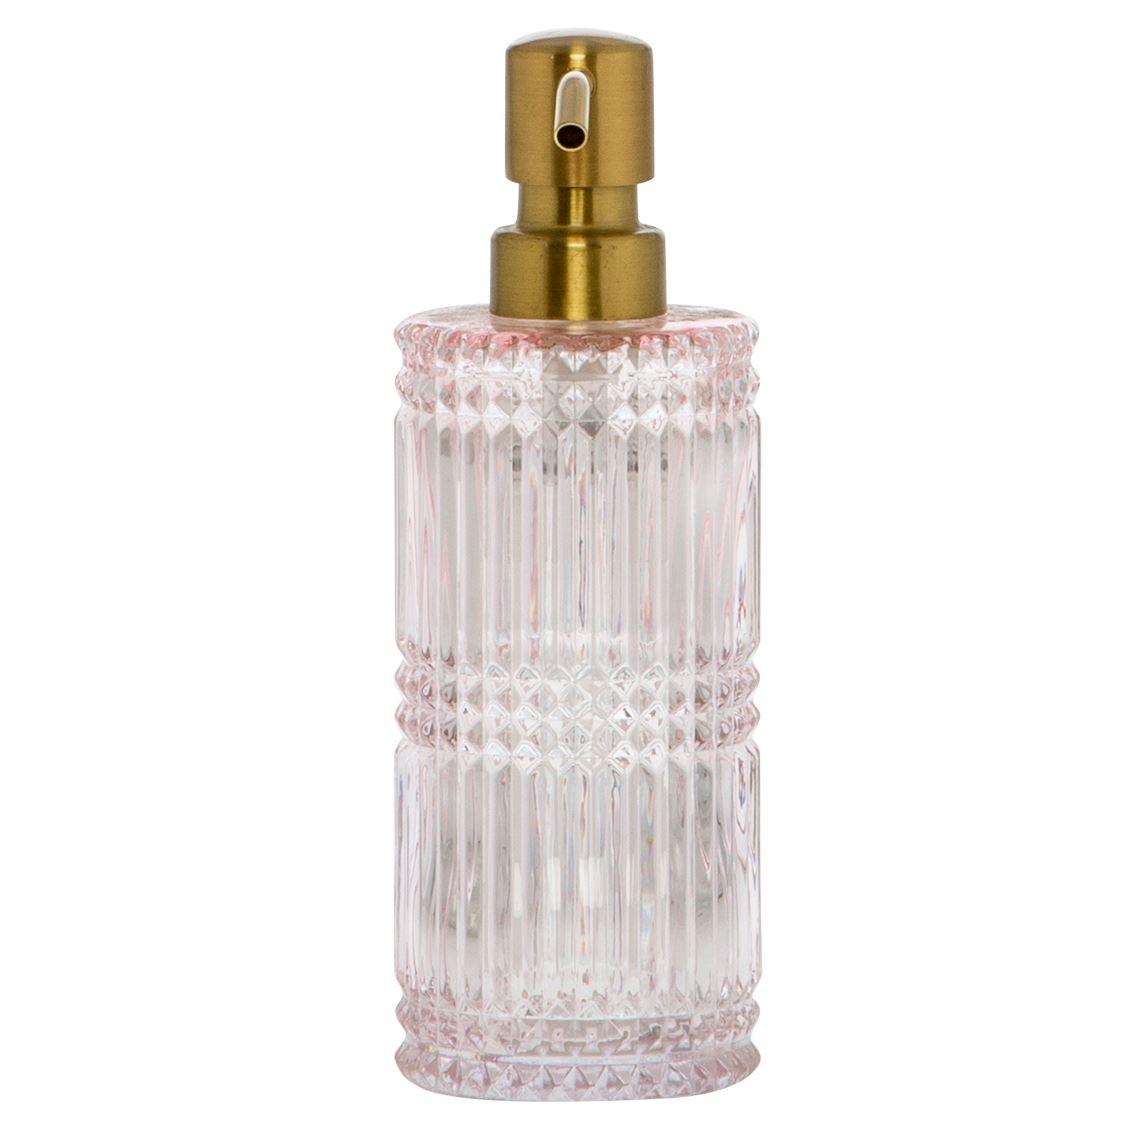 Mills Soap Dispenser Size W 7cm x D 7cm x H 19cm in Pink Freedom